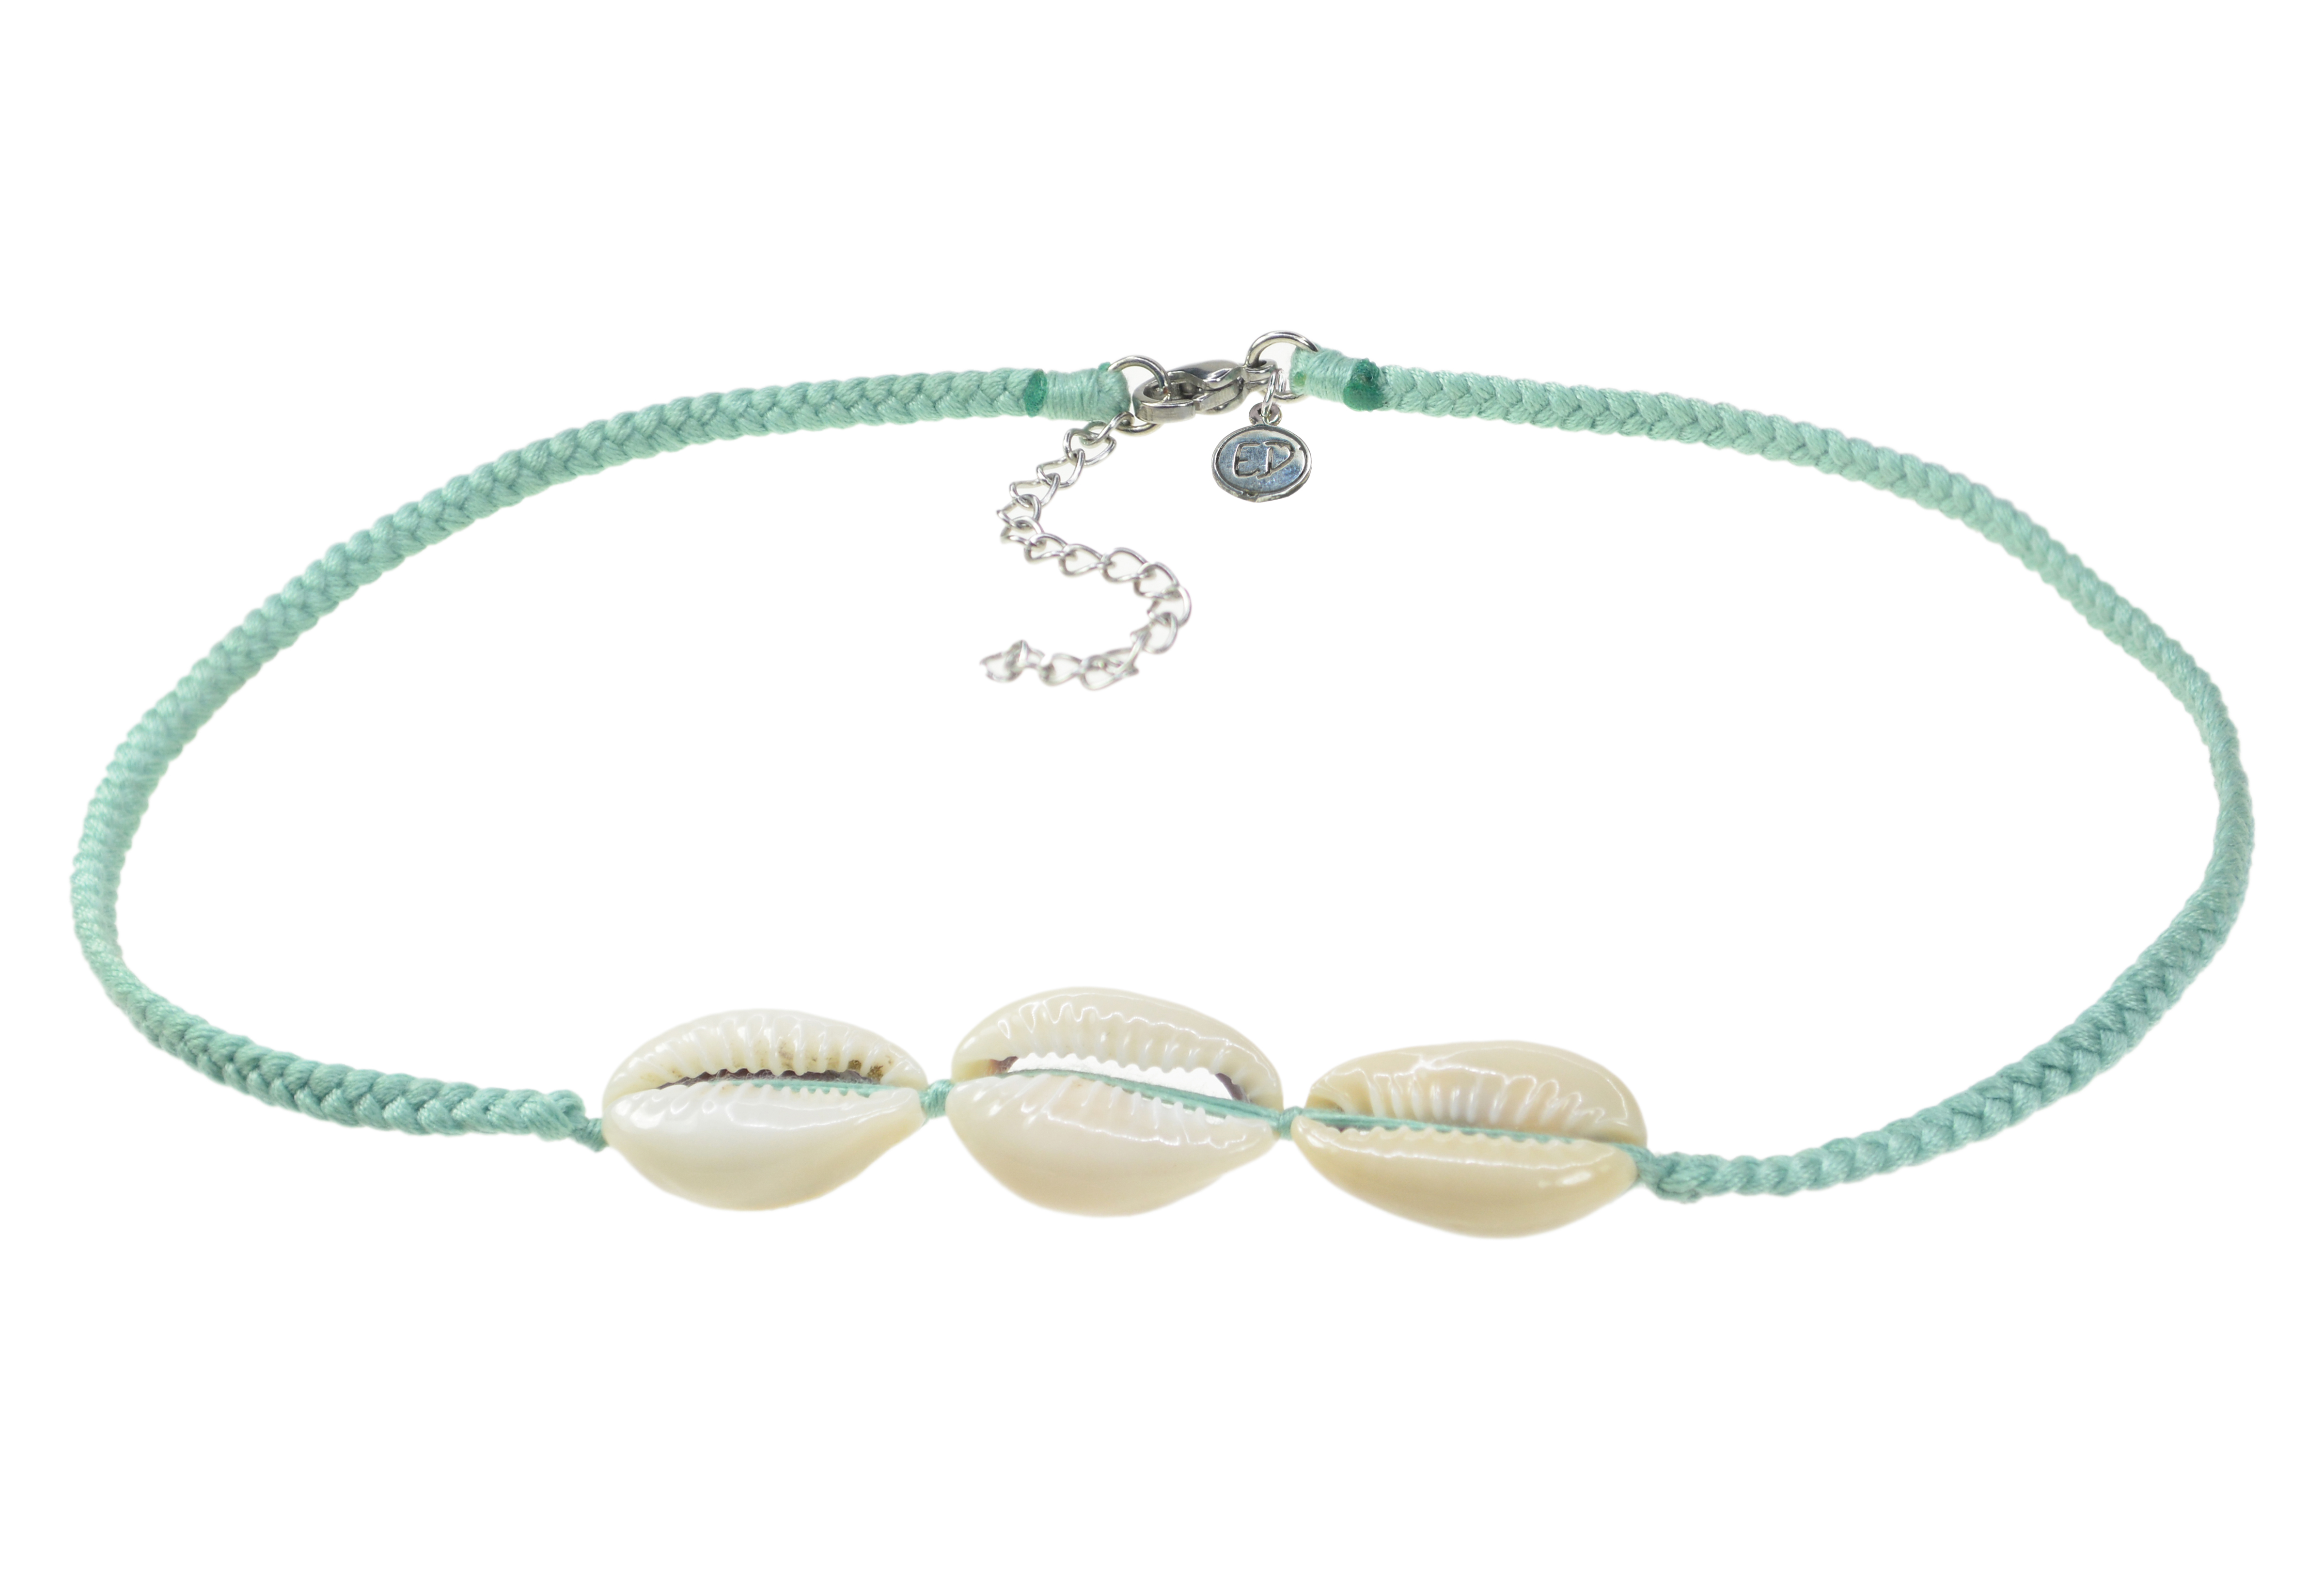 Dámsky ručne pletený náhrdelník  s tromi mušľami - Neo Mint